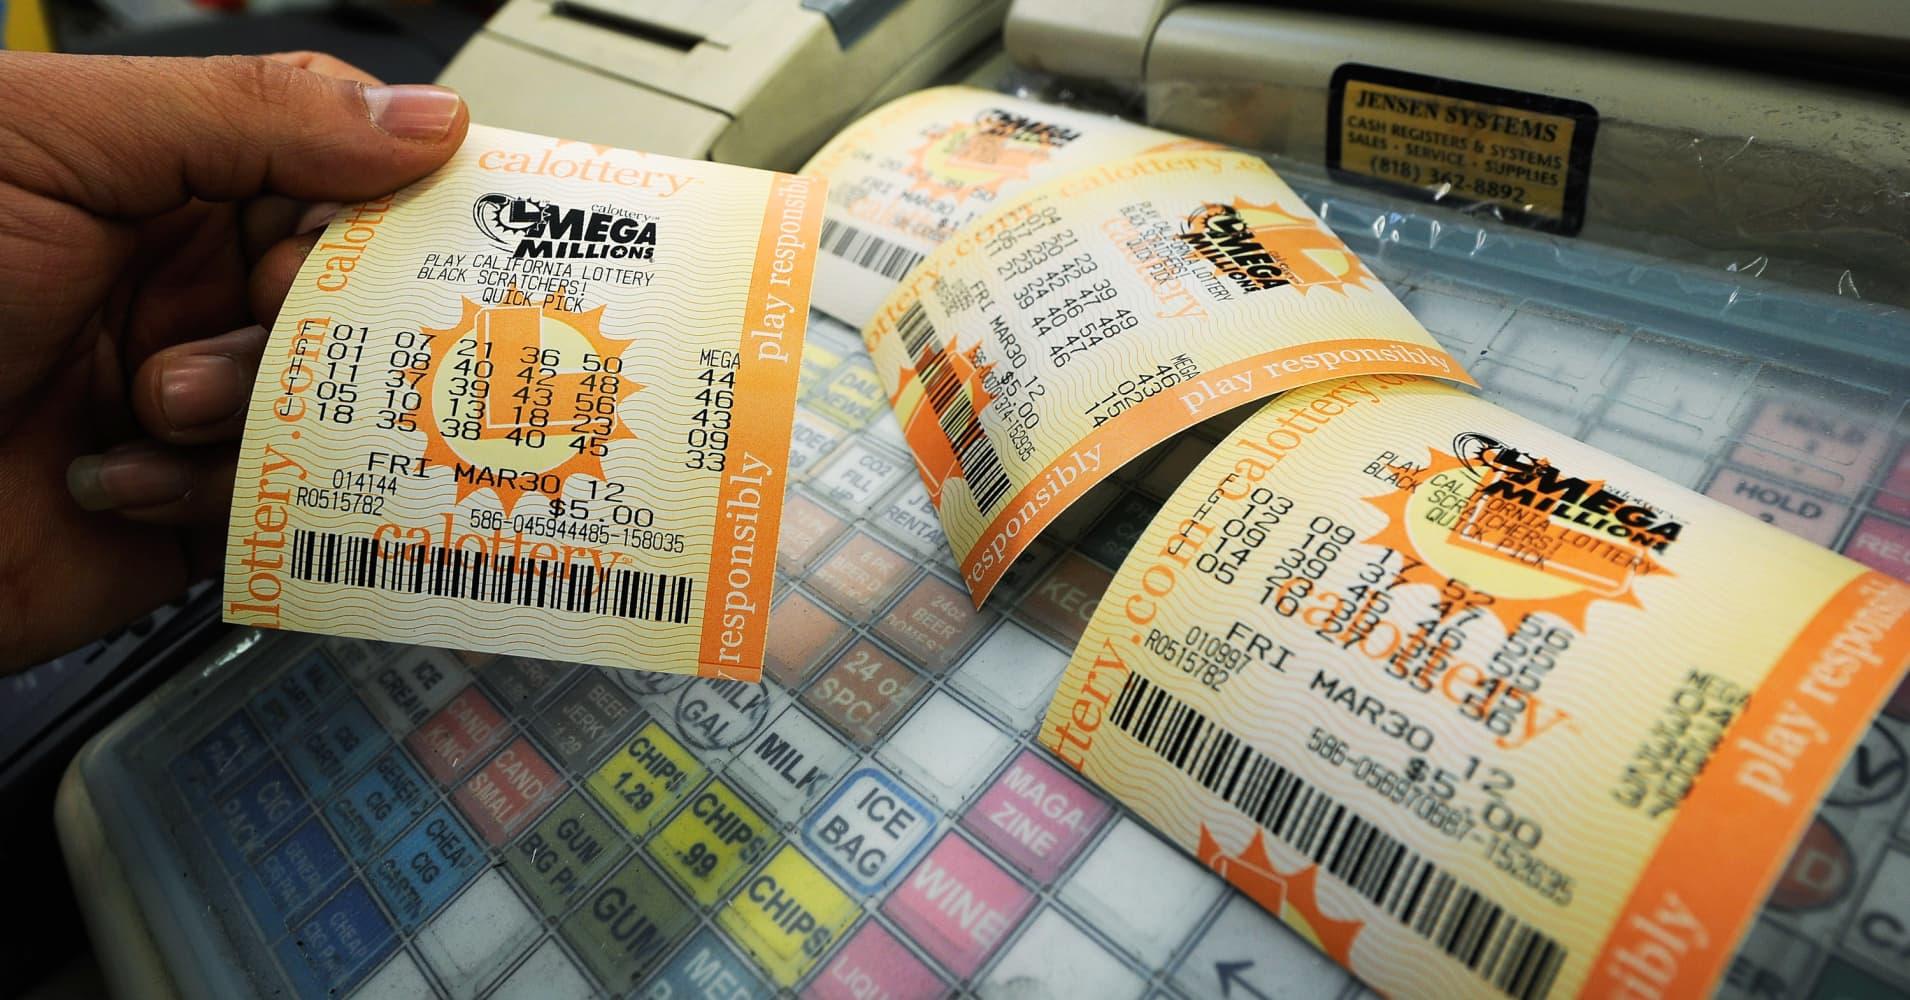 Mega Millions jackpot climbs to $454 million, drawing Tuesday